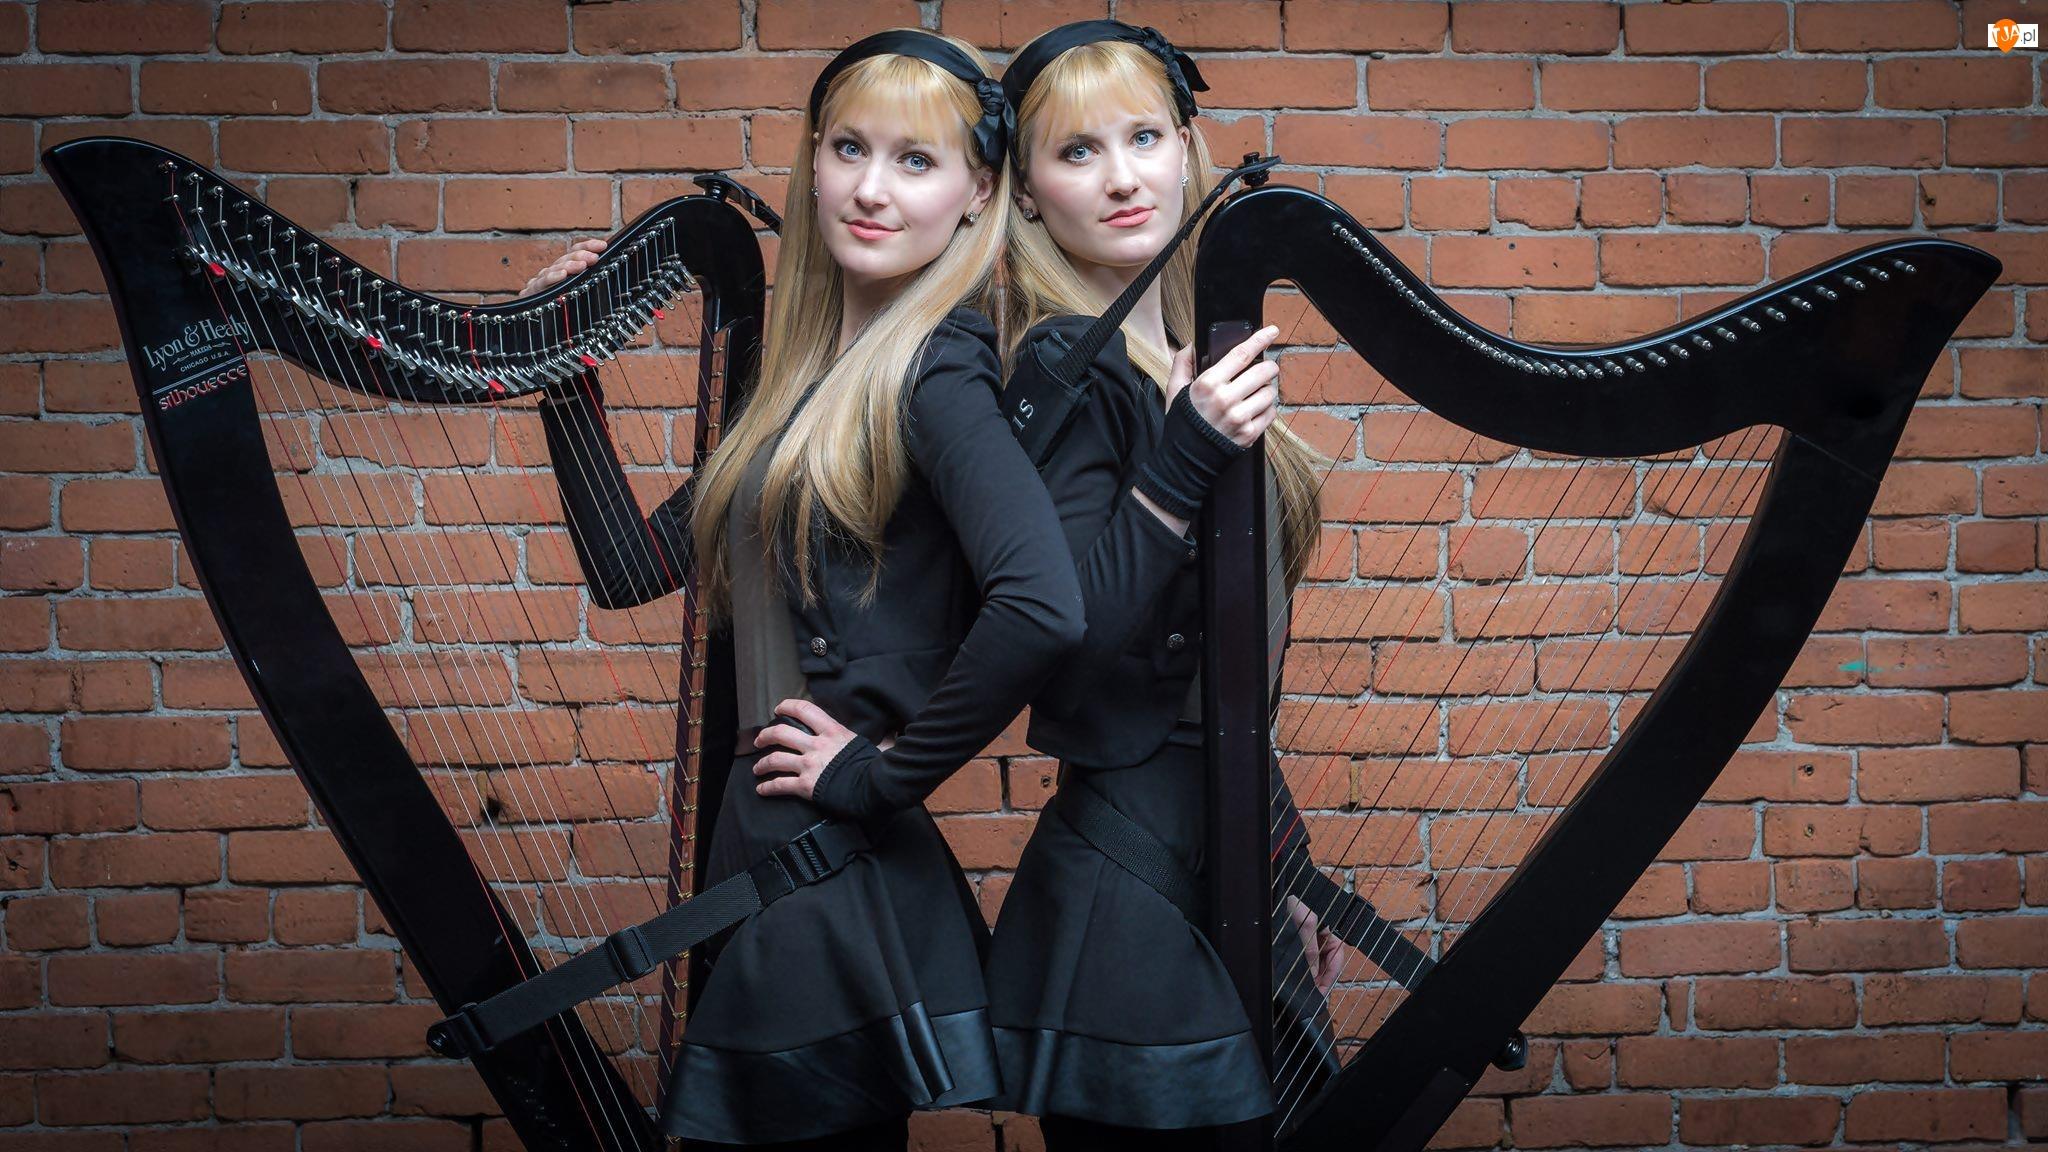 Camille Kitt, Kobiety, Bliźniaczki, Harfy, Kennerly Kitt, The Harp Twins